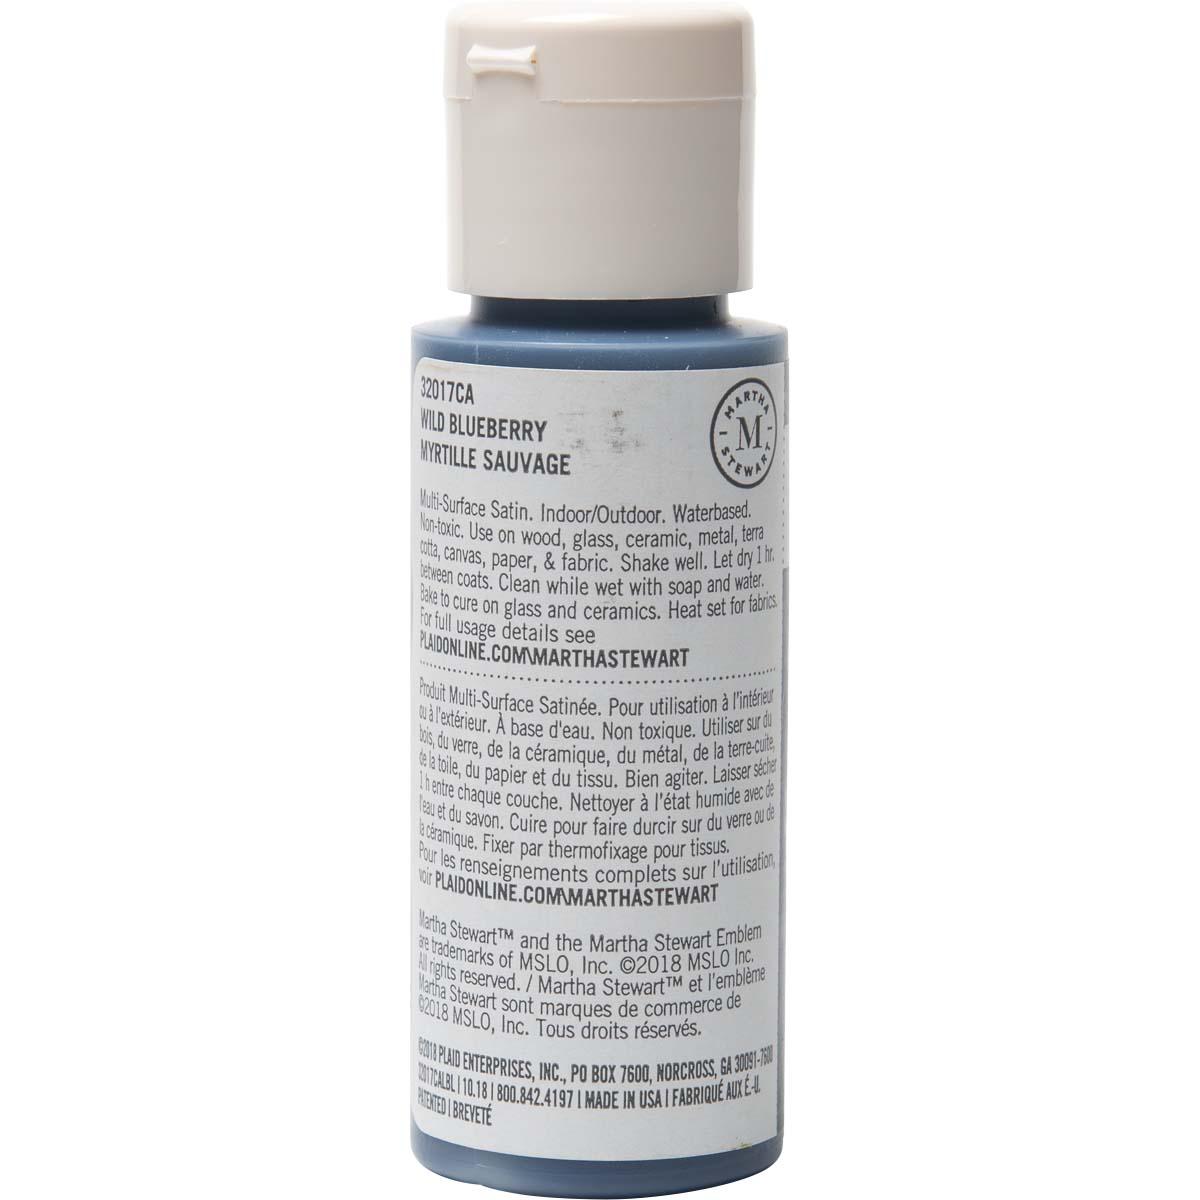 Martha Stewart® 2oz Multi-Surface Satin Acrylic Craft Paint - Wild Blueberry